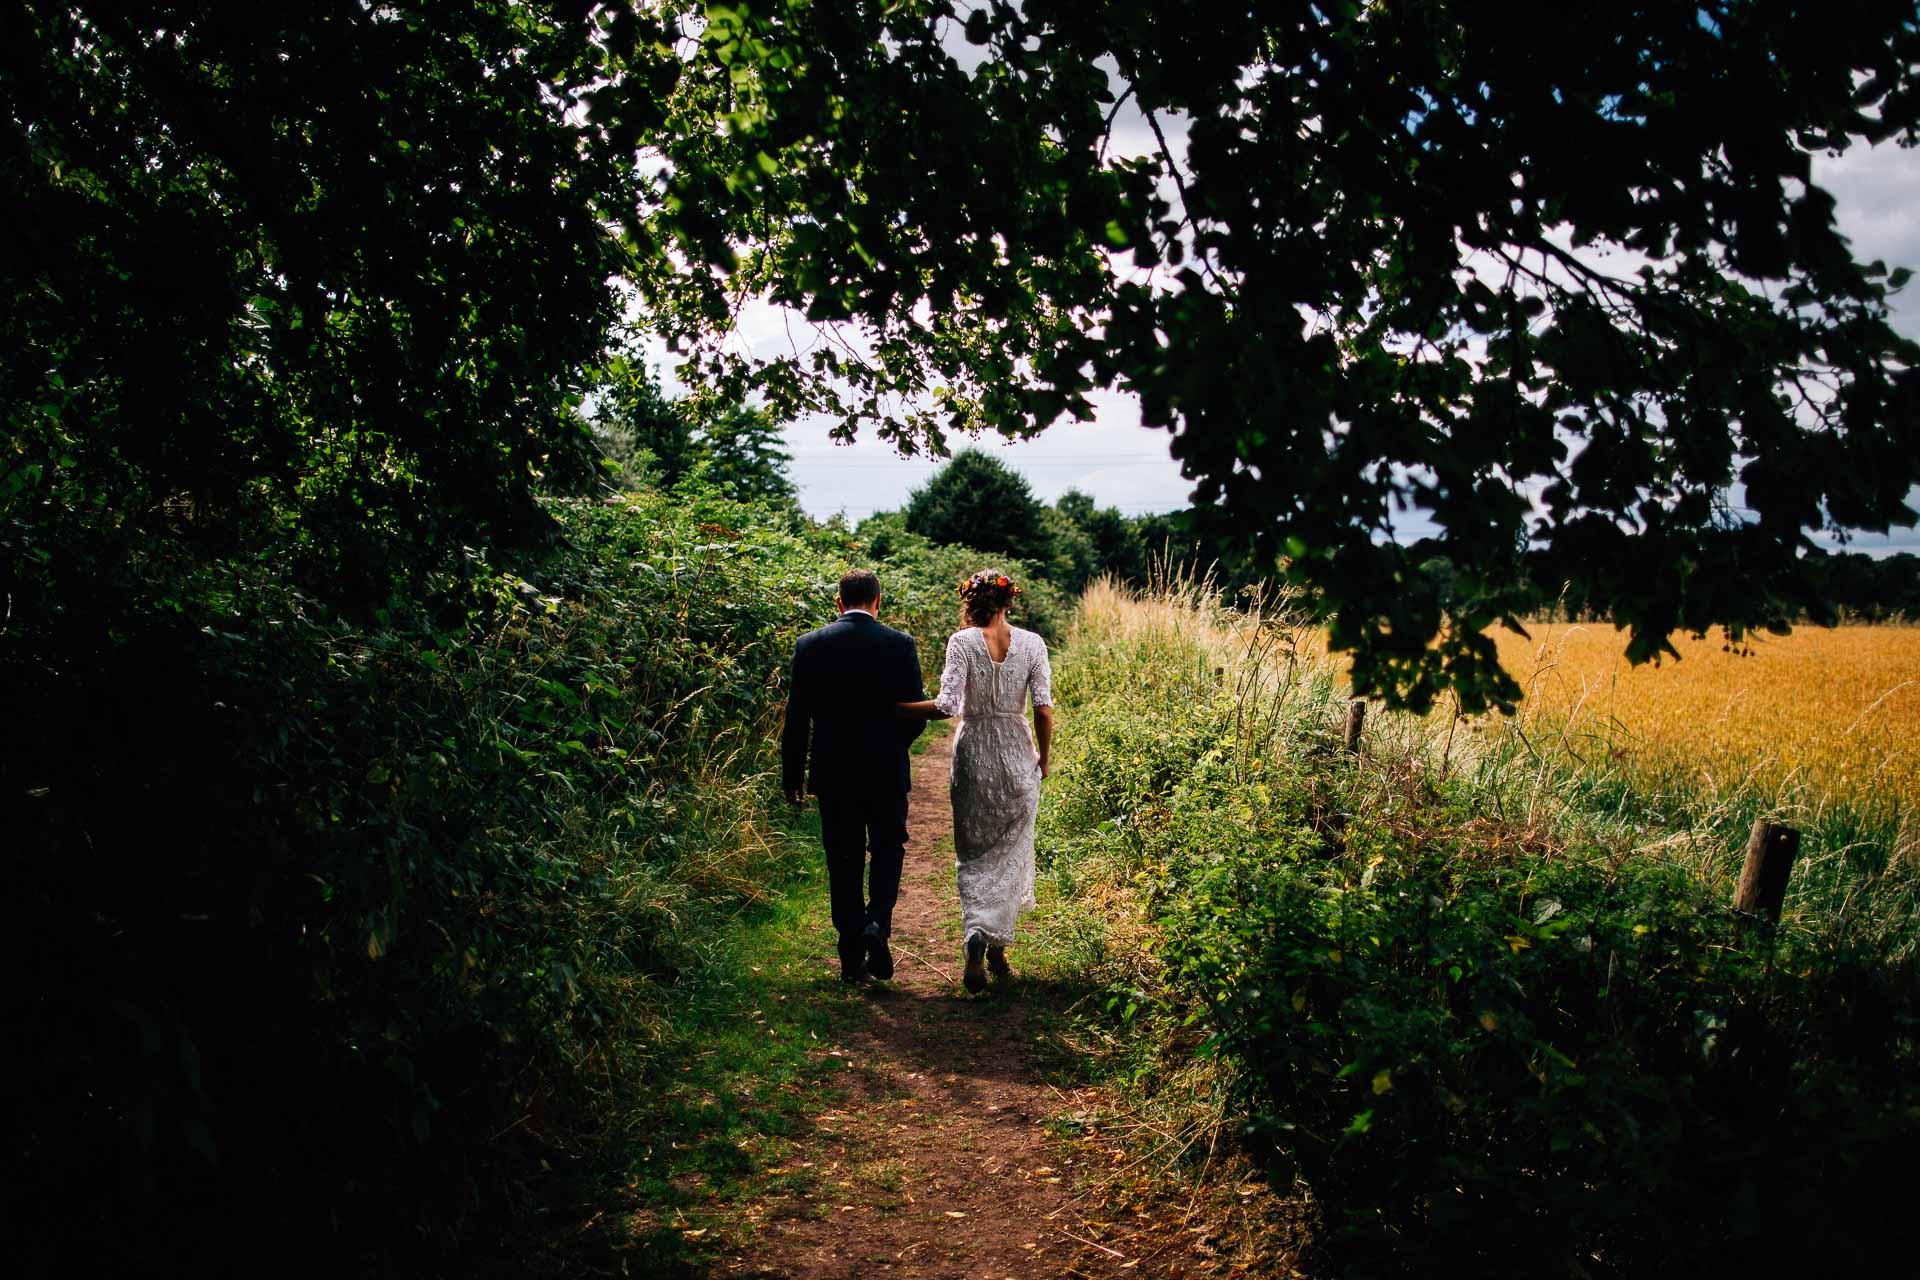 winterbourne-medieval-barn-wedding-photography-emma-andrew-84